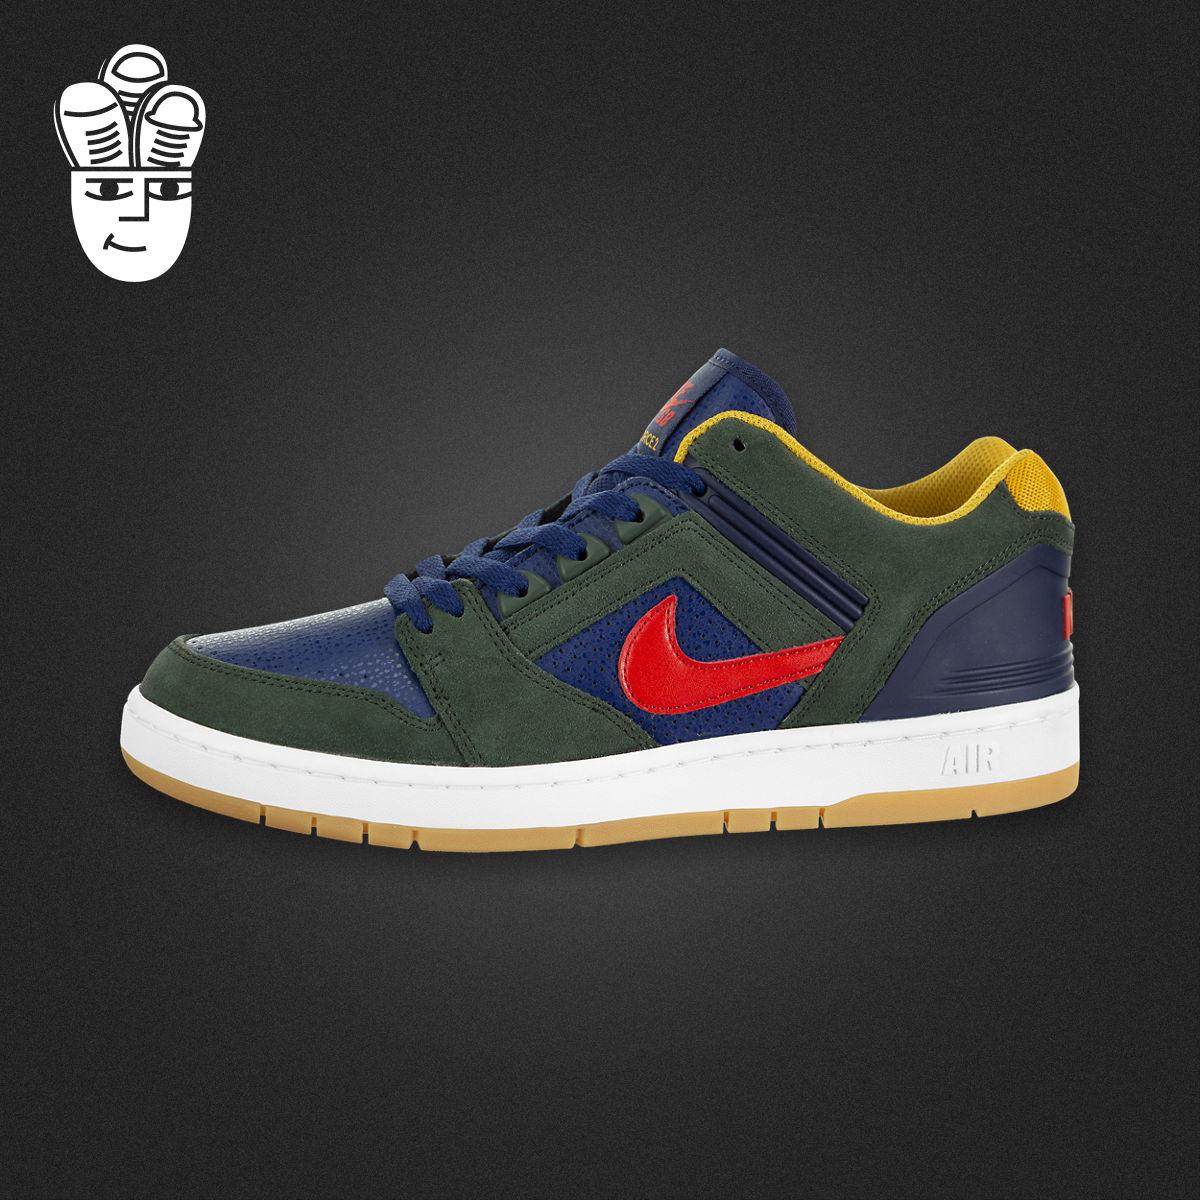 Nike SB Air Force II Low 耐克男鞋 空军二号低帮运动休闲鞋板鞋